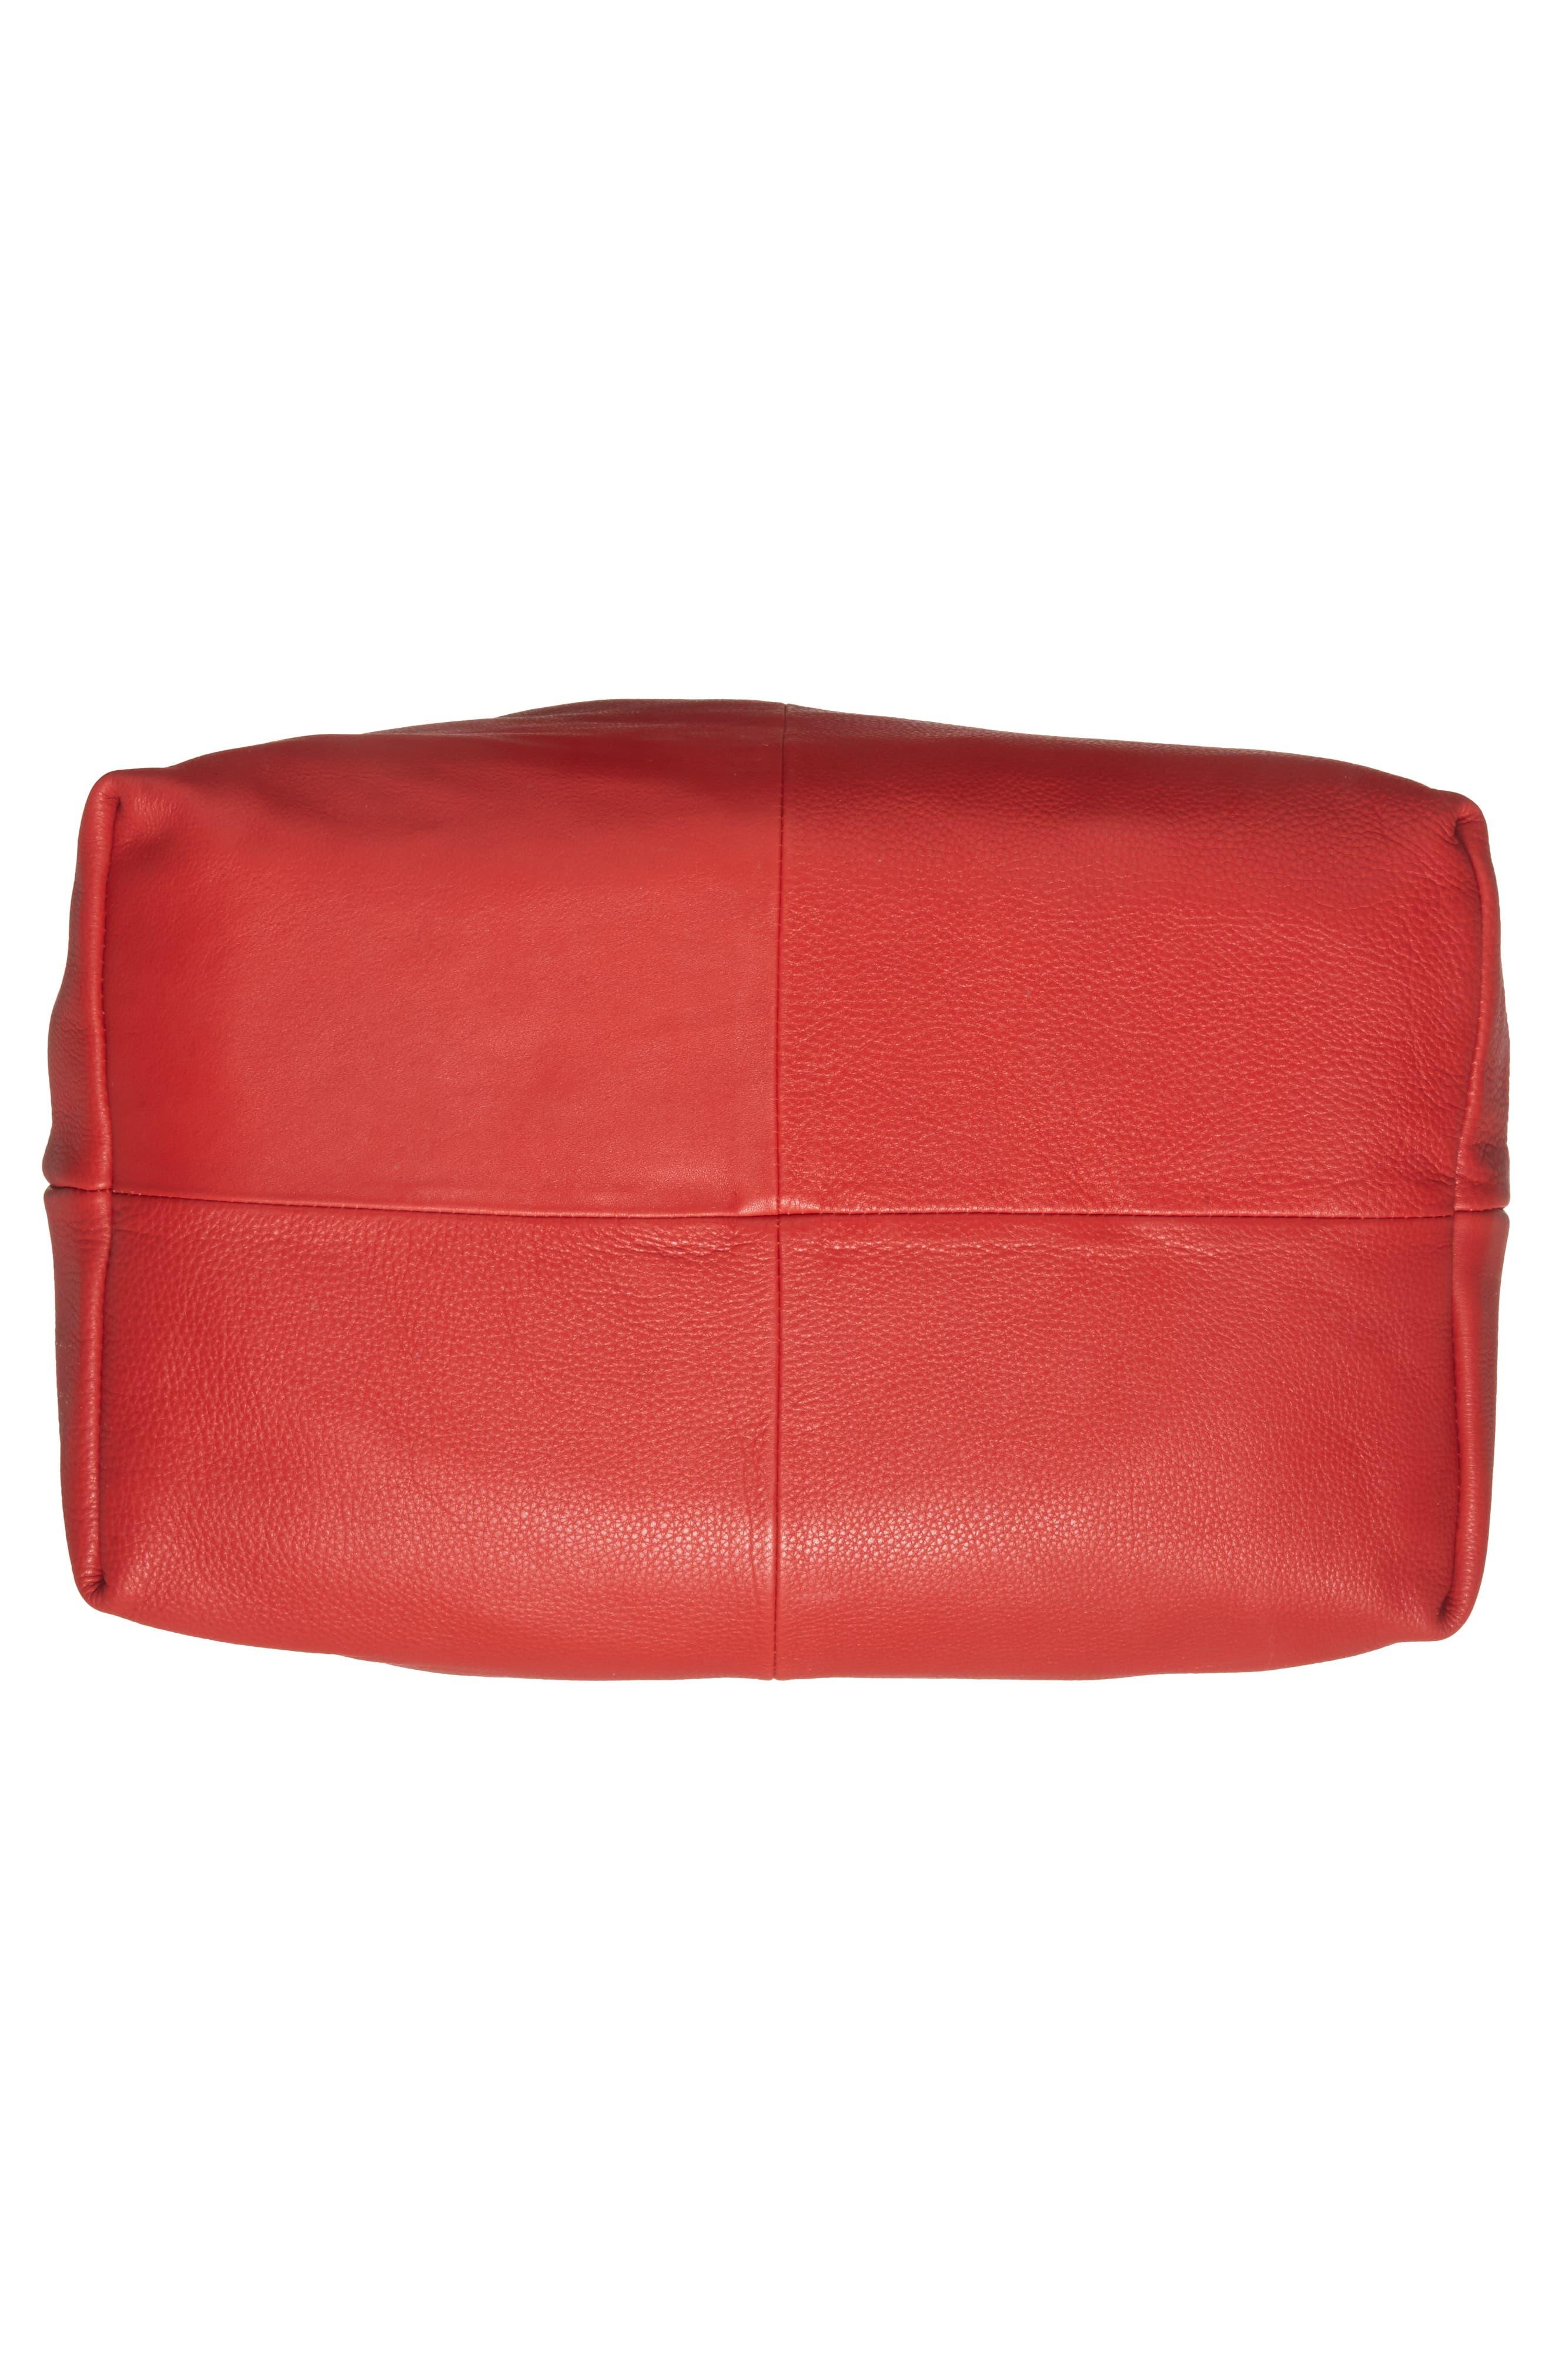 Premium Leather Jasmine Hobo Bag,                             Alternate thumbnail 5, color,                             Red